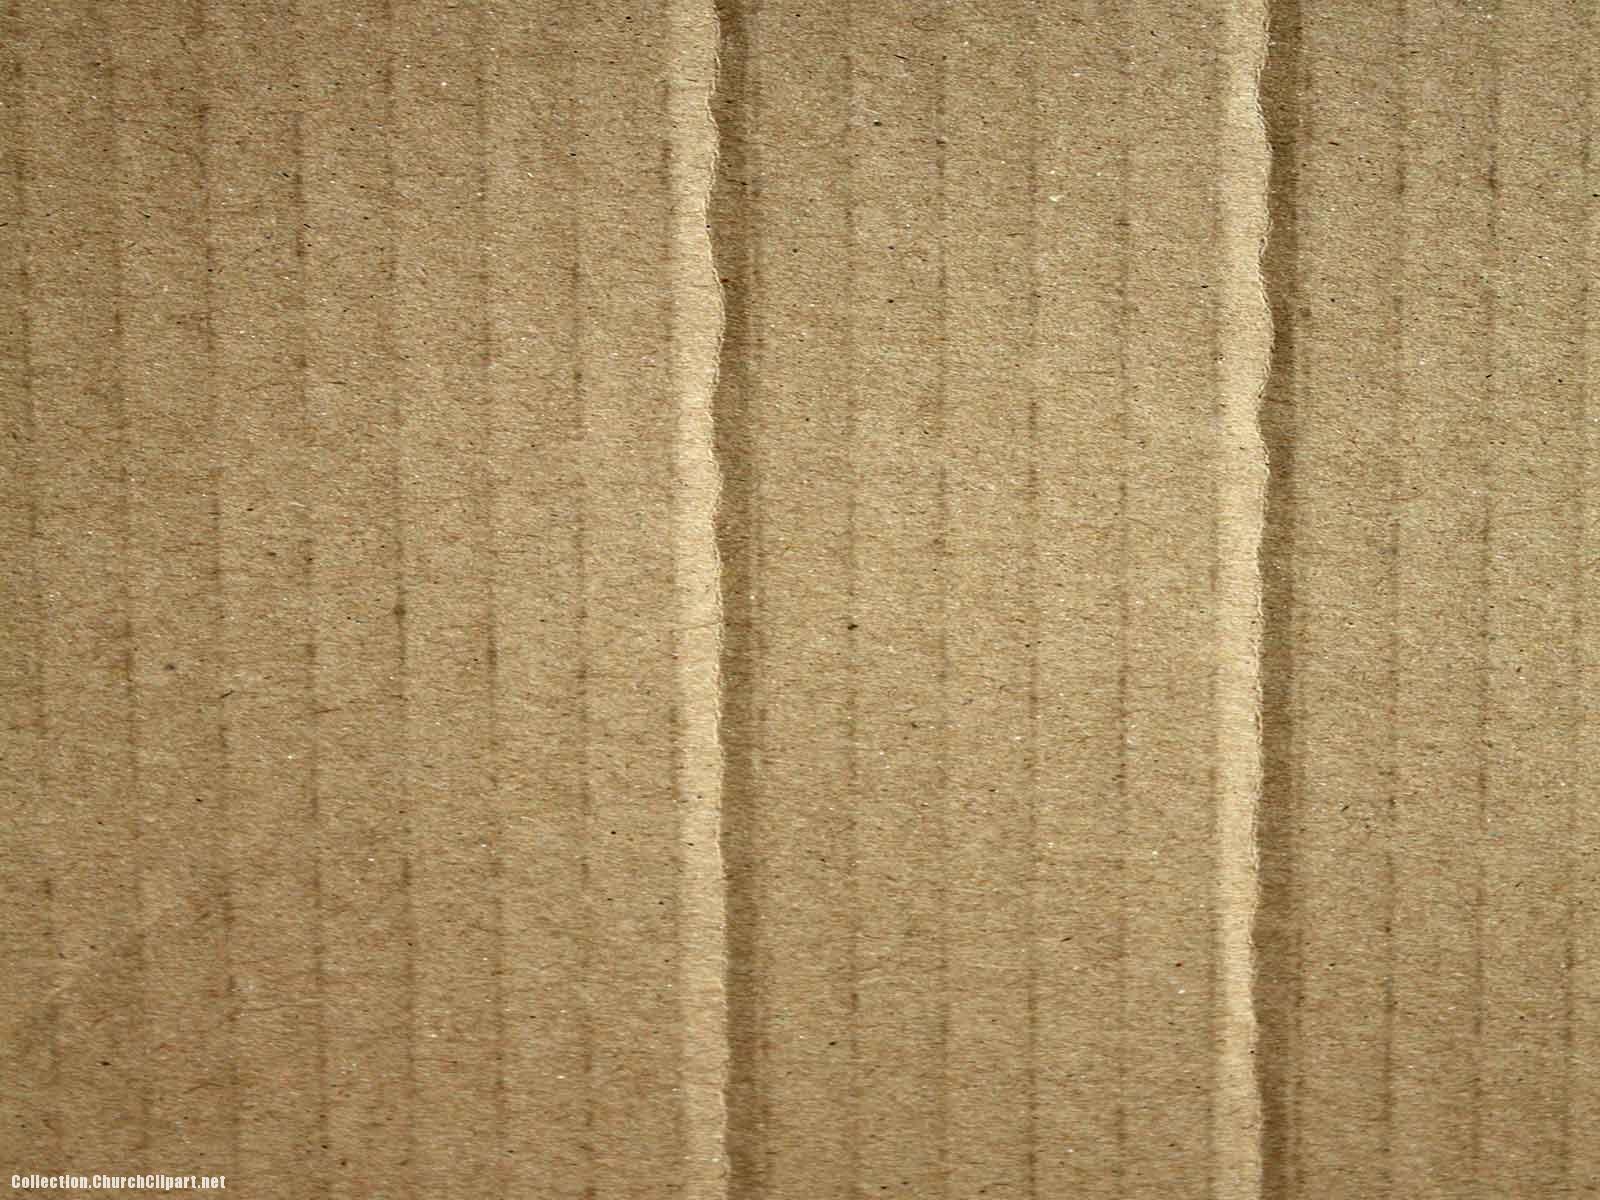 cardboard-textures-paper-background